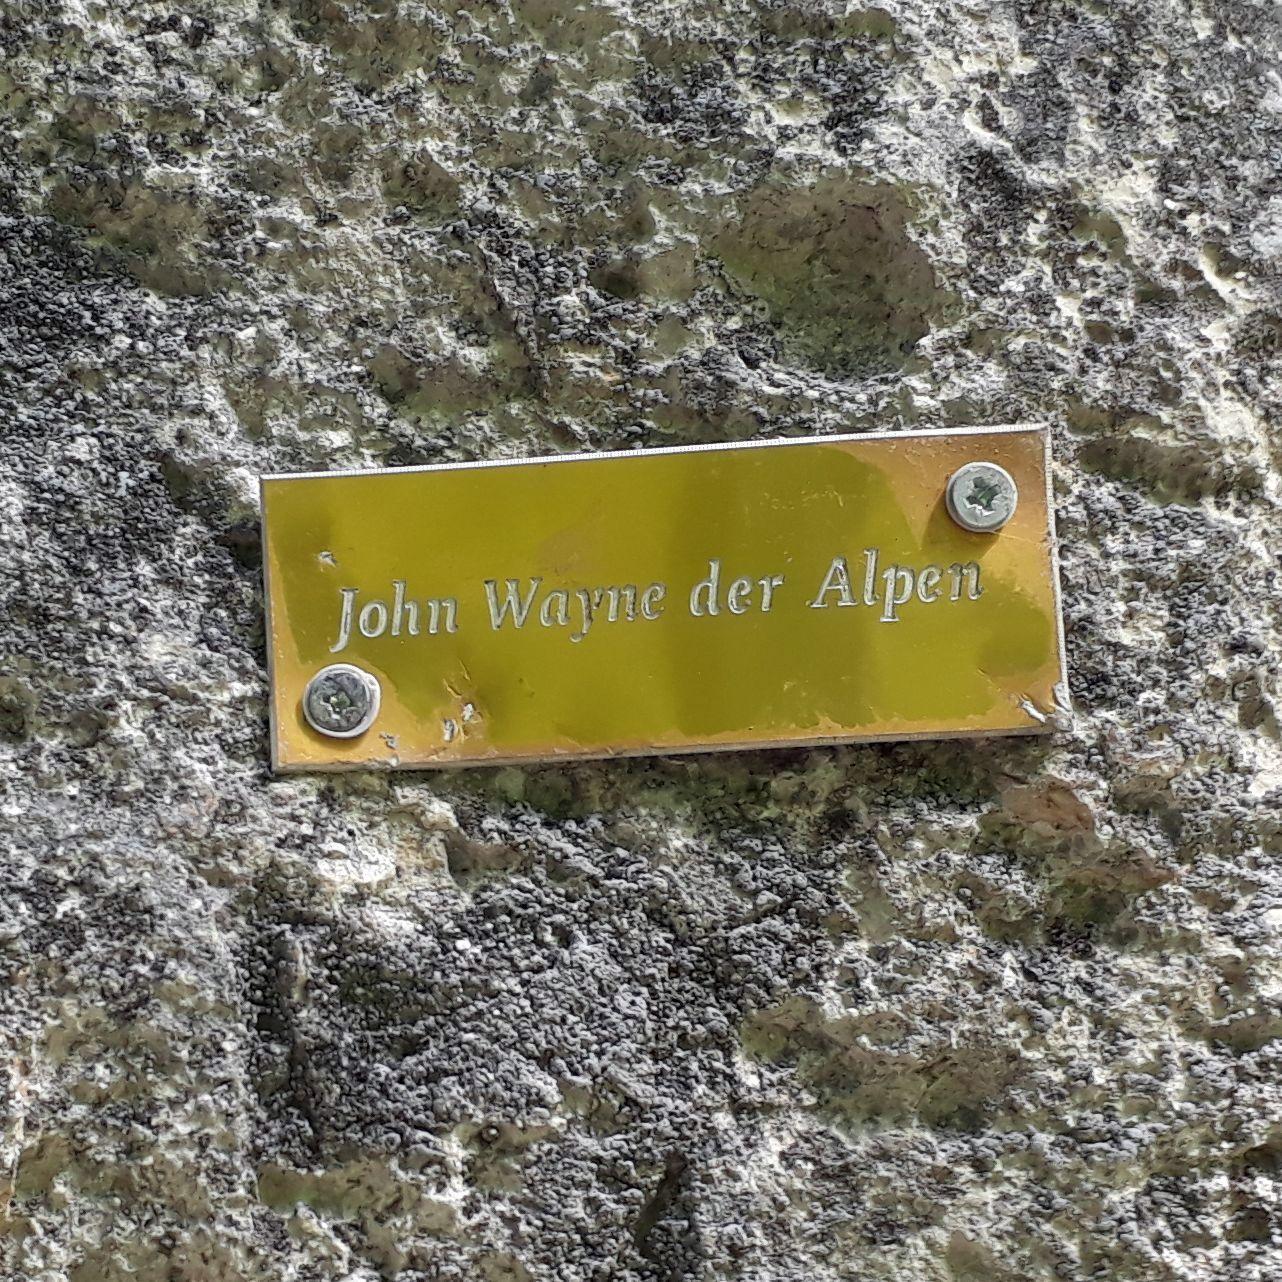 Prvá cesta dňa - John Wayne der Alpen